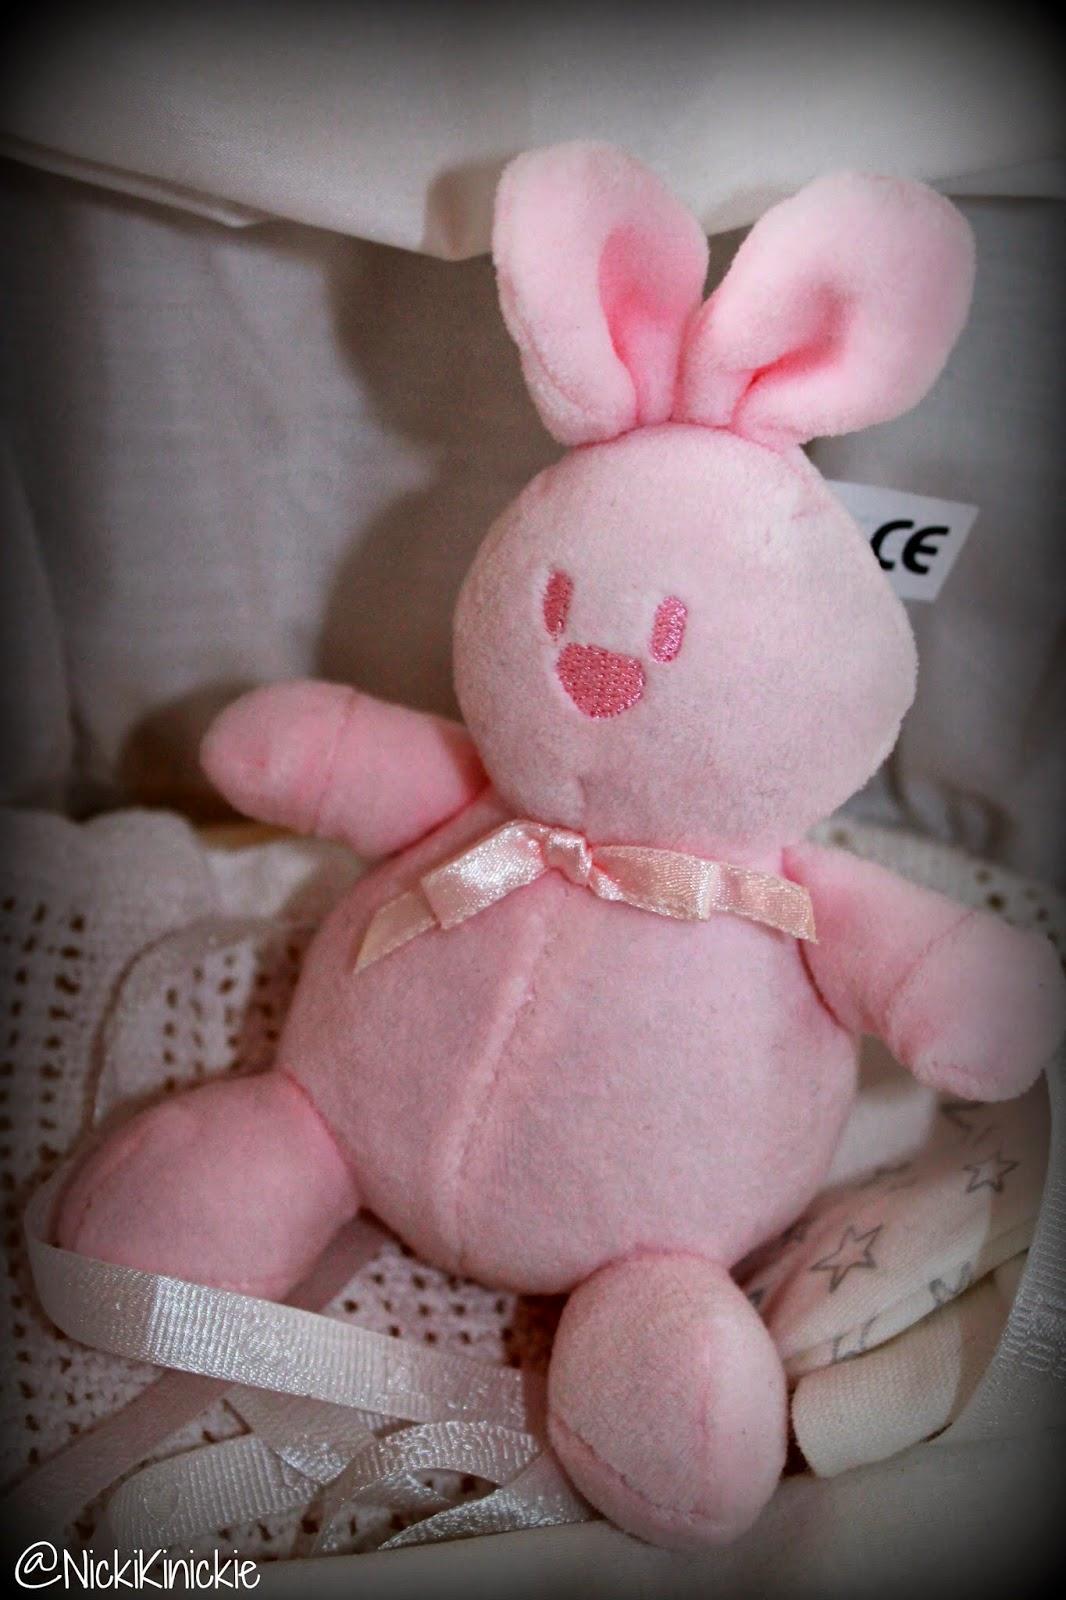 New Baby, Pink Bunny, Nicki Kinickie